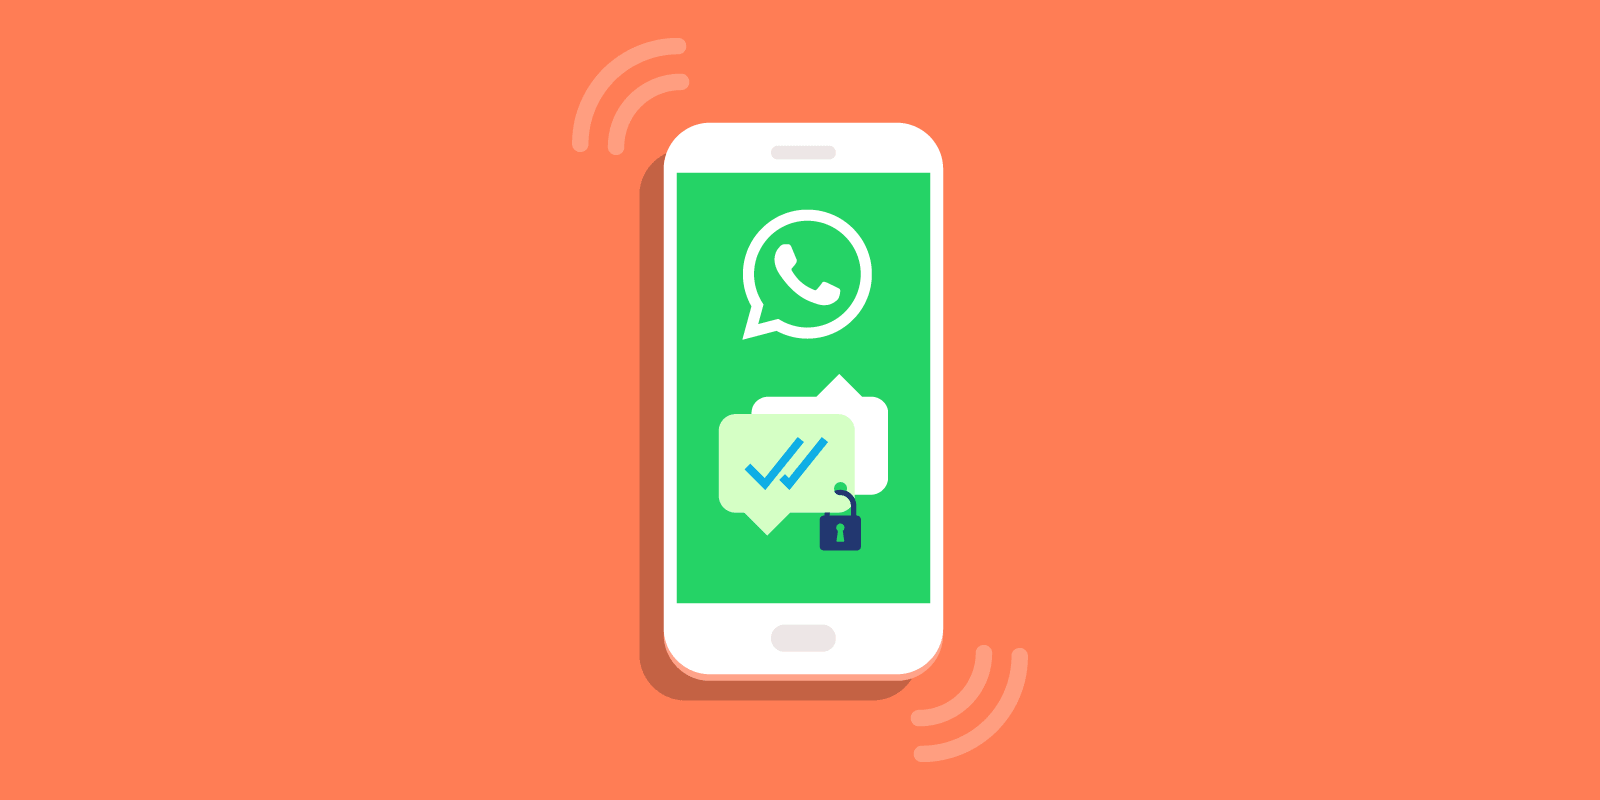 Смартфон главы Amazon взломали с помощью WhatsApp